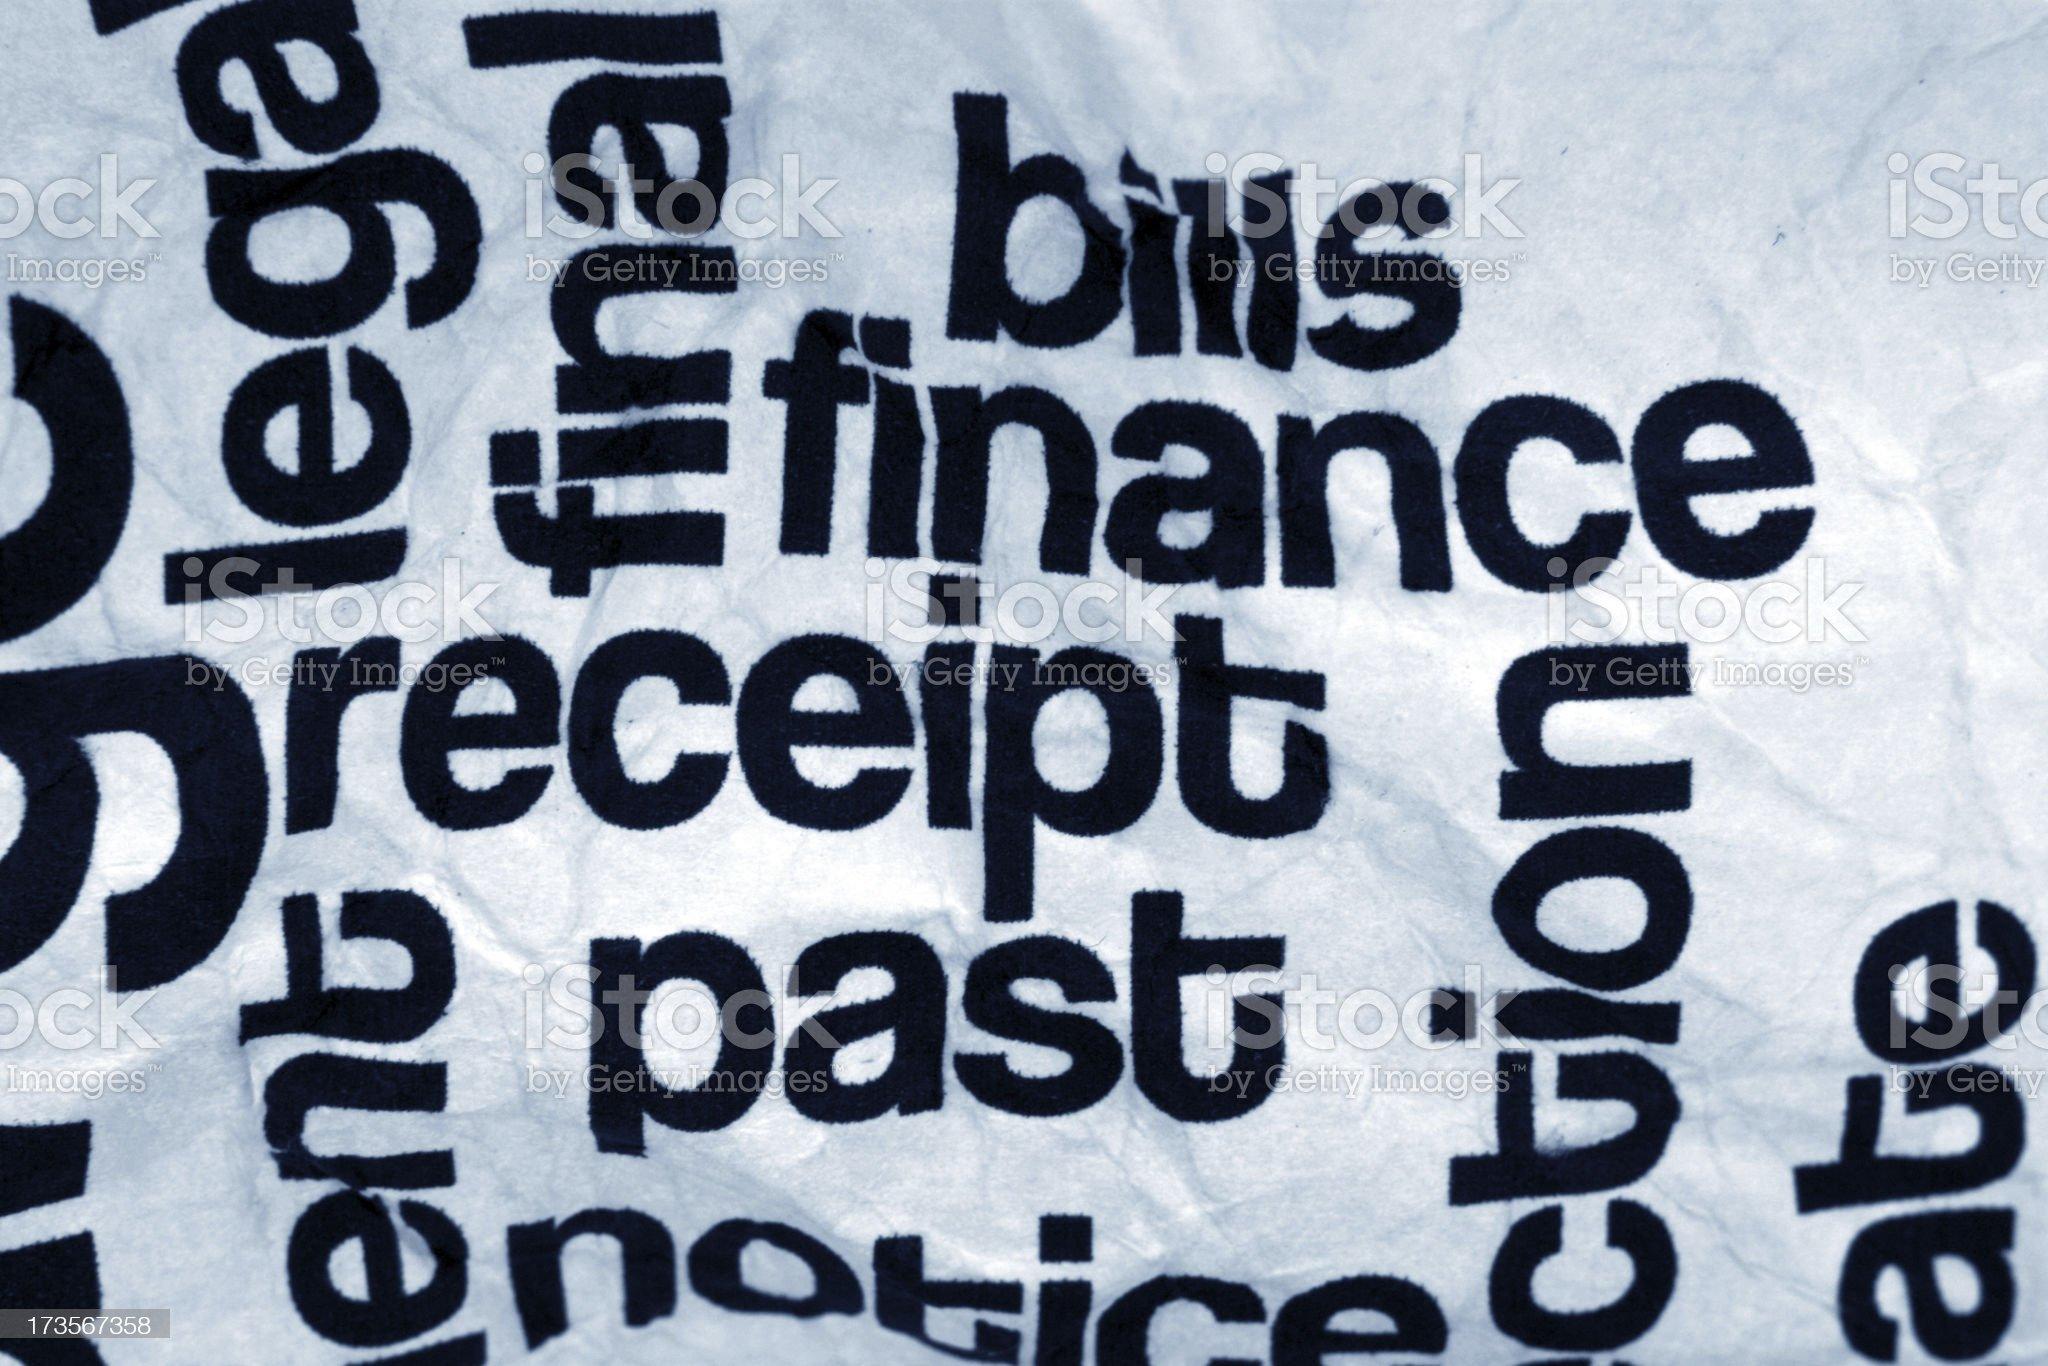 Finance receipt bills royalty-free stock photo